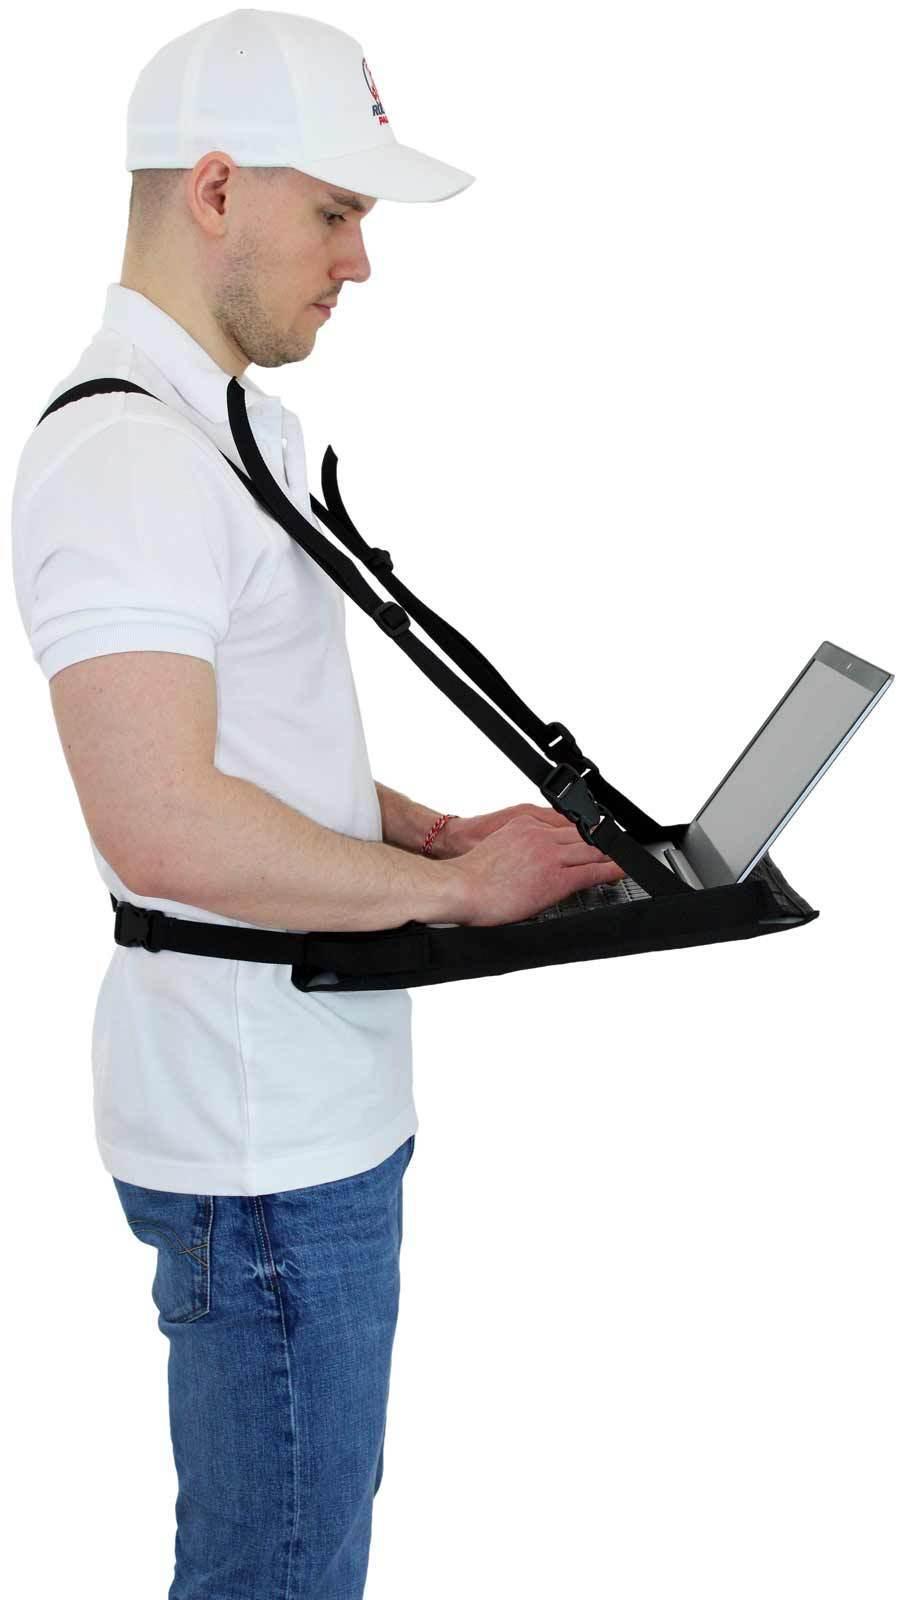 Laptop Supporter Inventur Notebook Supporter Laptop Bauchladen Bauchladen Bauchladen Laptop Halter f70115